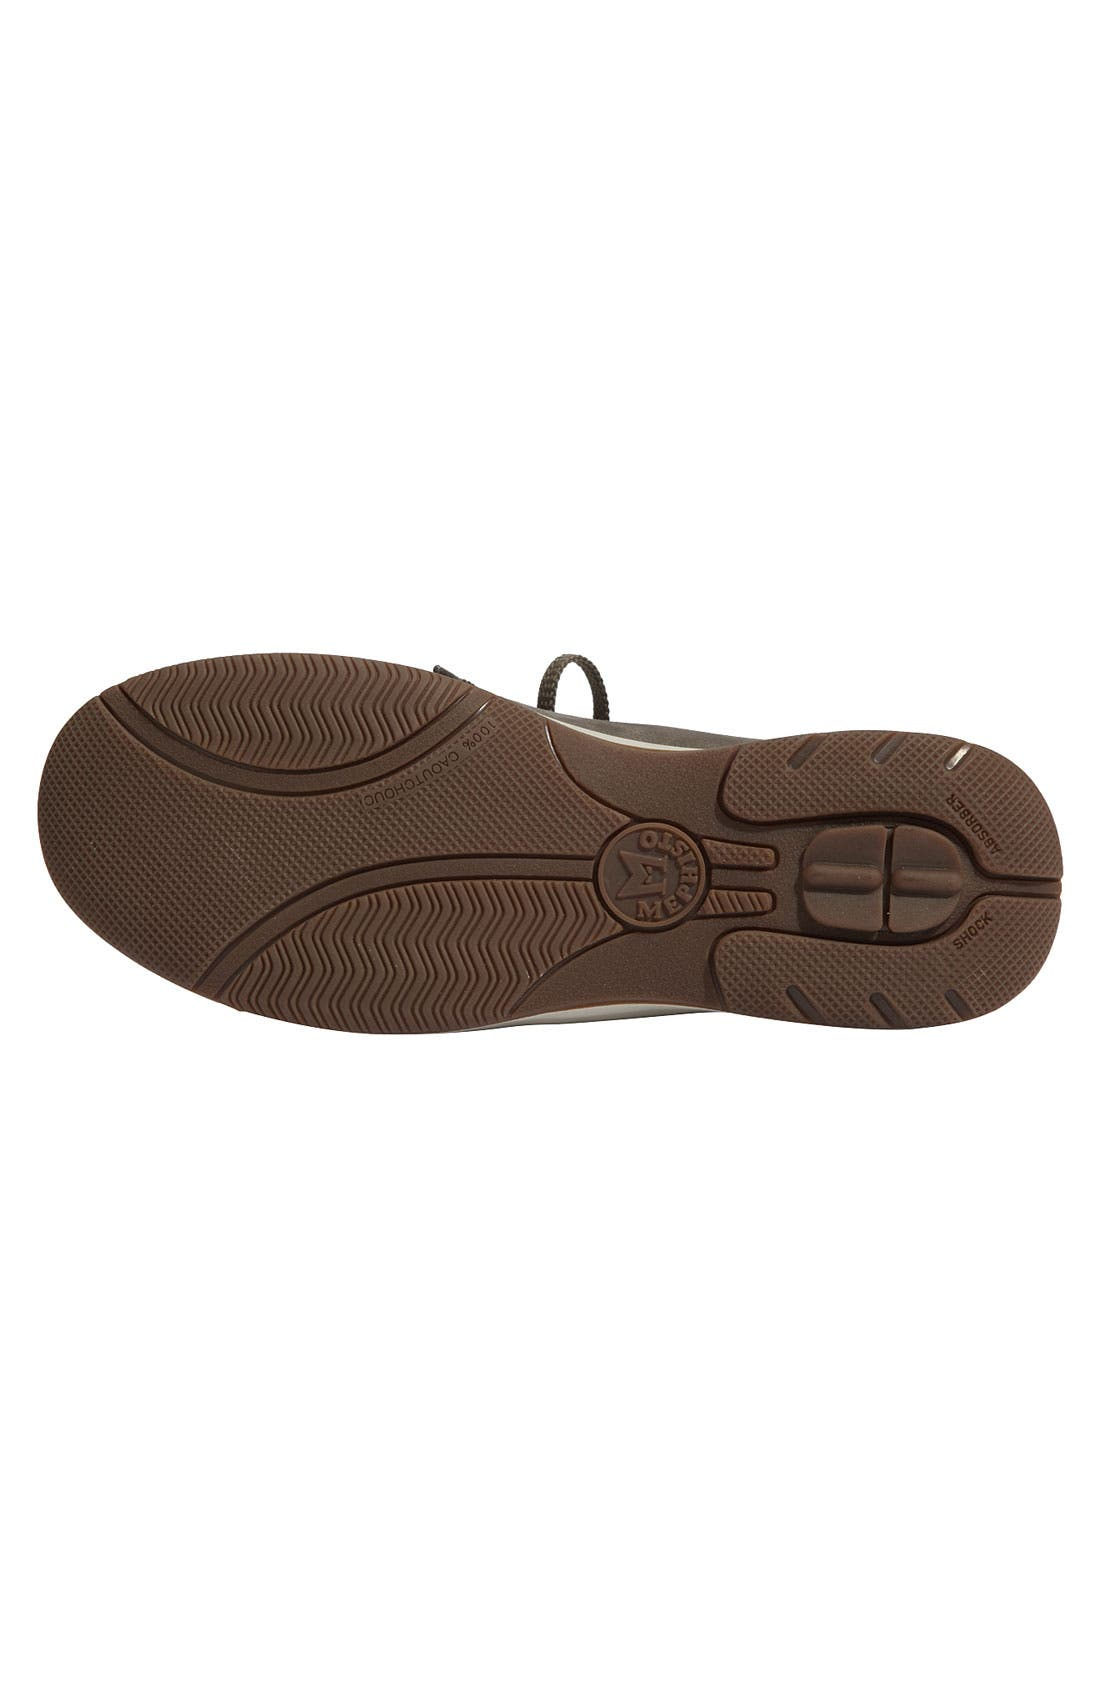 'Hike' Perforated Walking Shoe,                             Alternate thumbnail 4, color,                             020